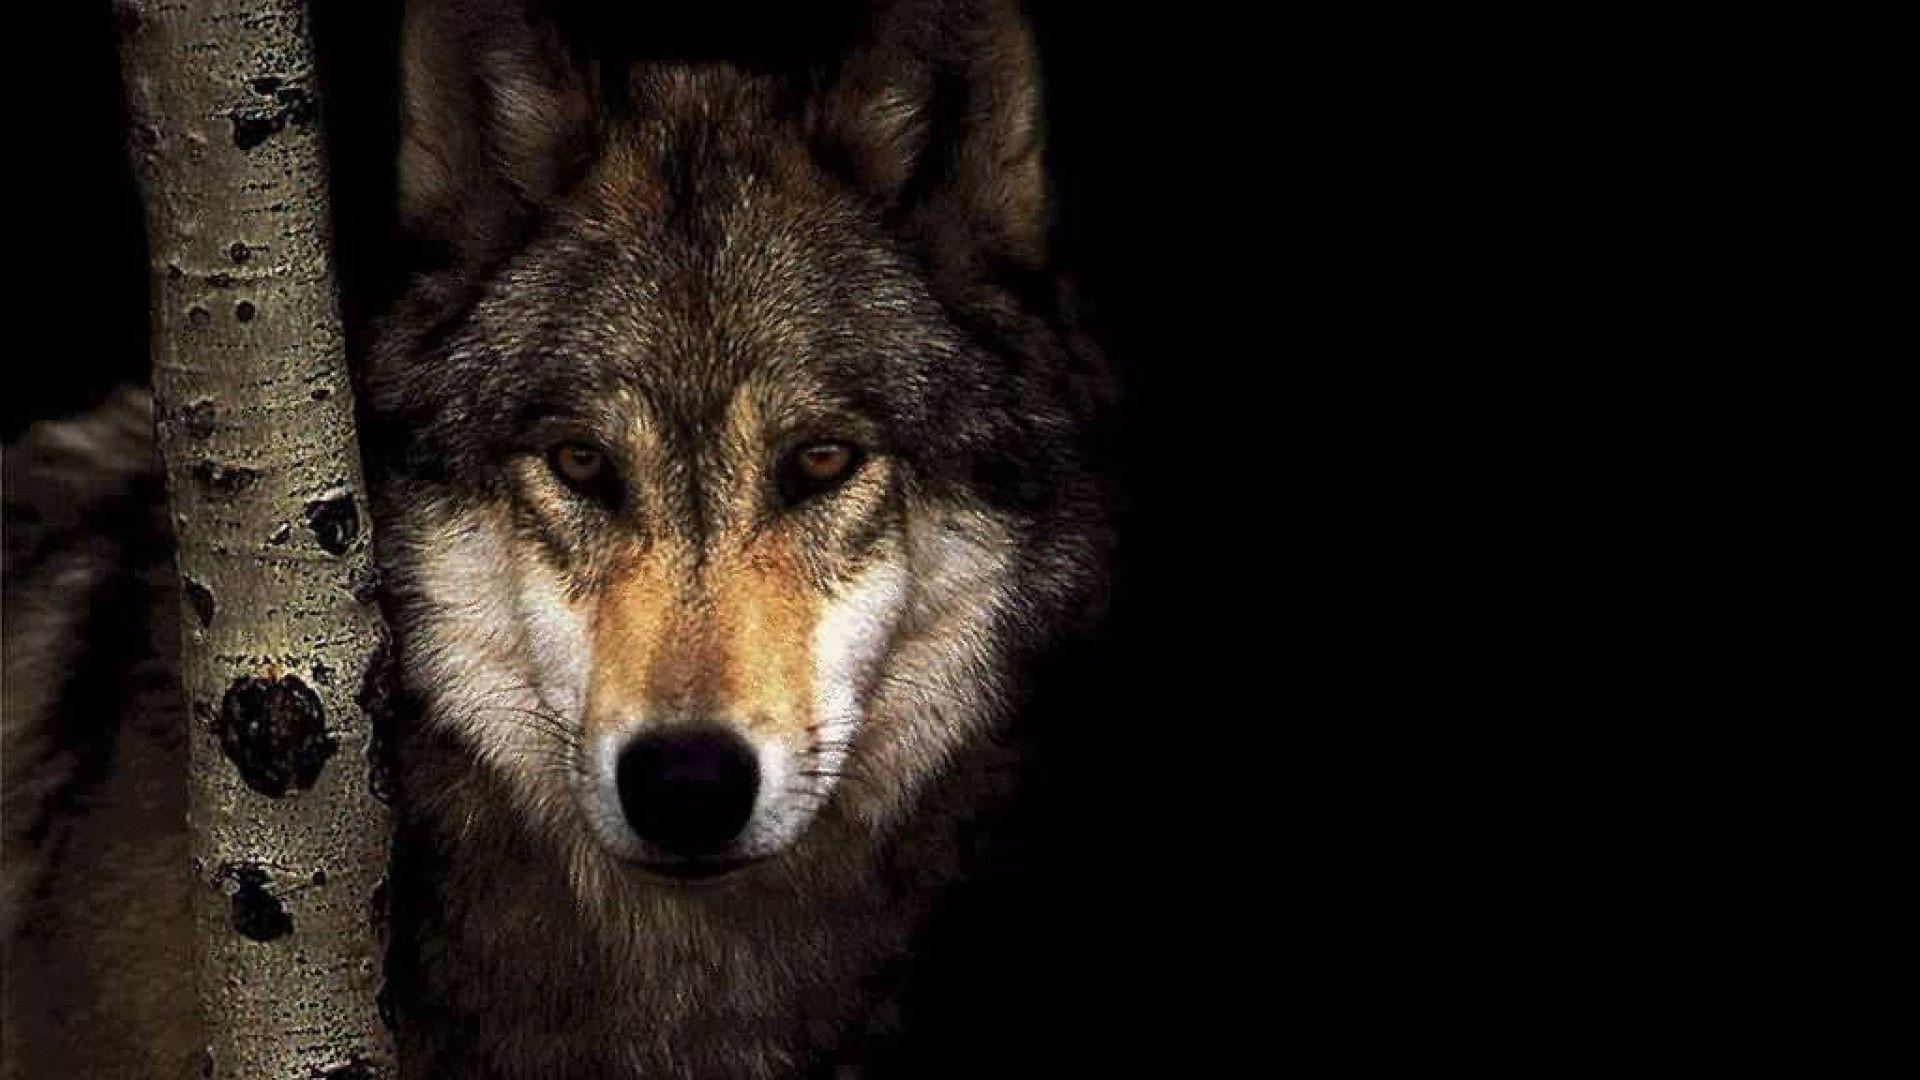 1212556 full size wolf desktop wallpaper 1920x1080 1920x1080 for samsung